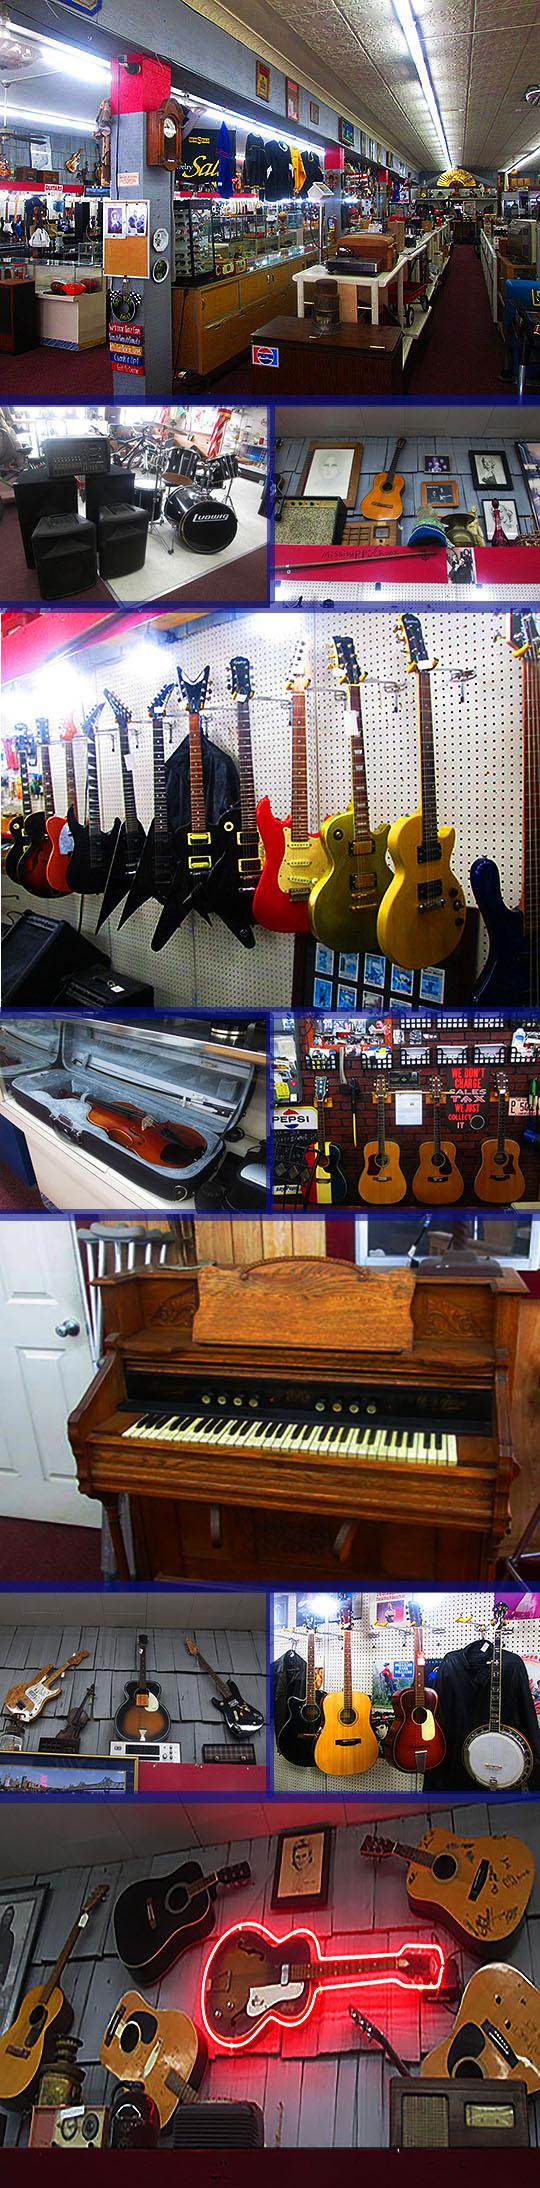 7. instruments_5-8-19.jpg